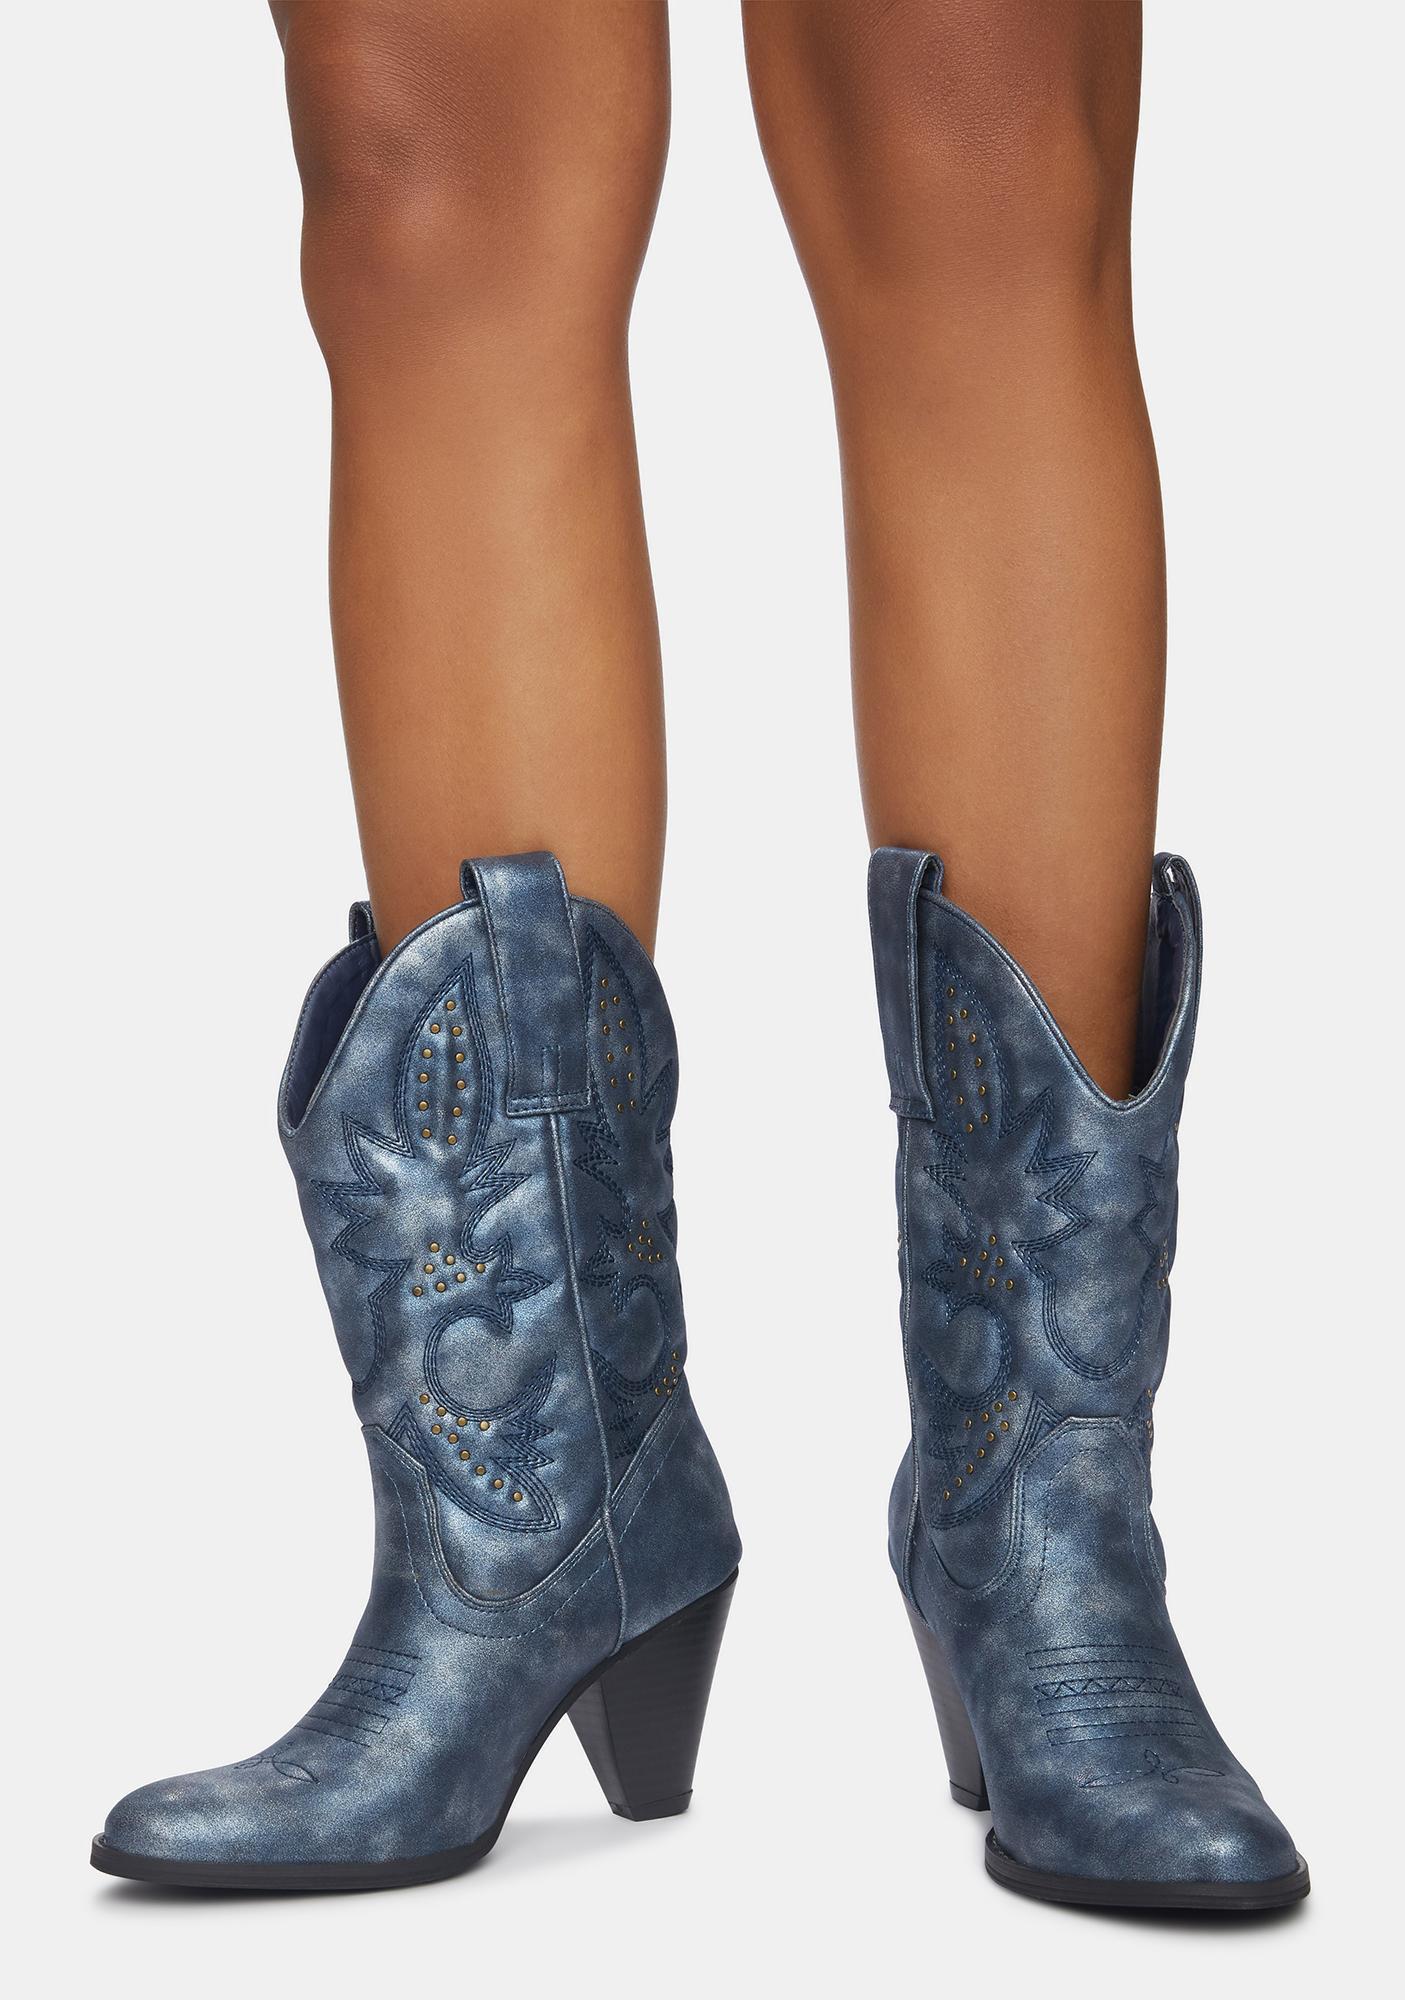 Volatile Shoes Navy Denver Cowboy Boots